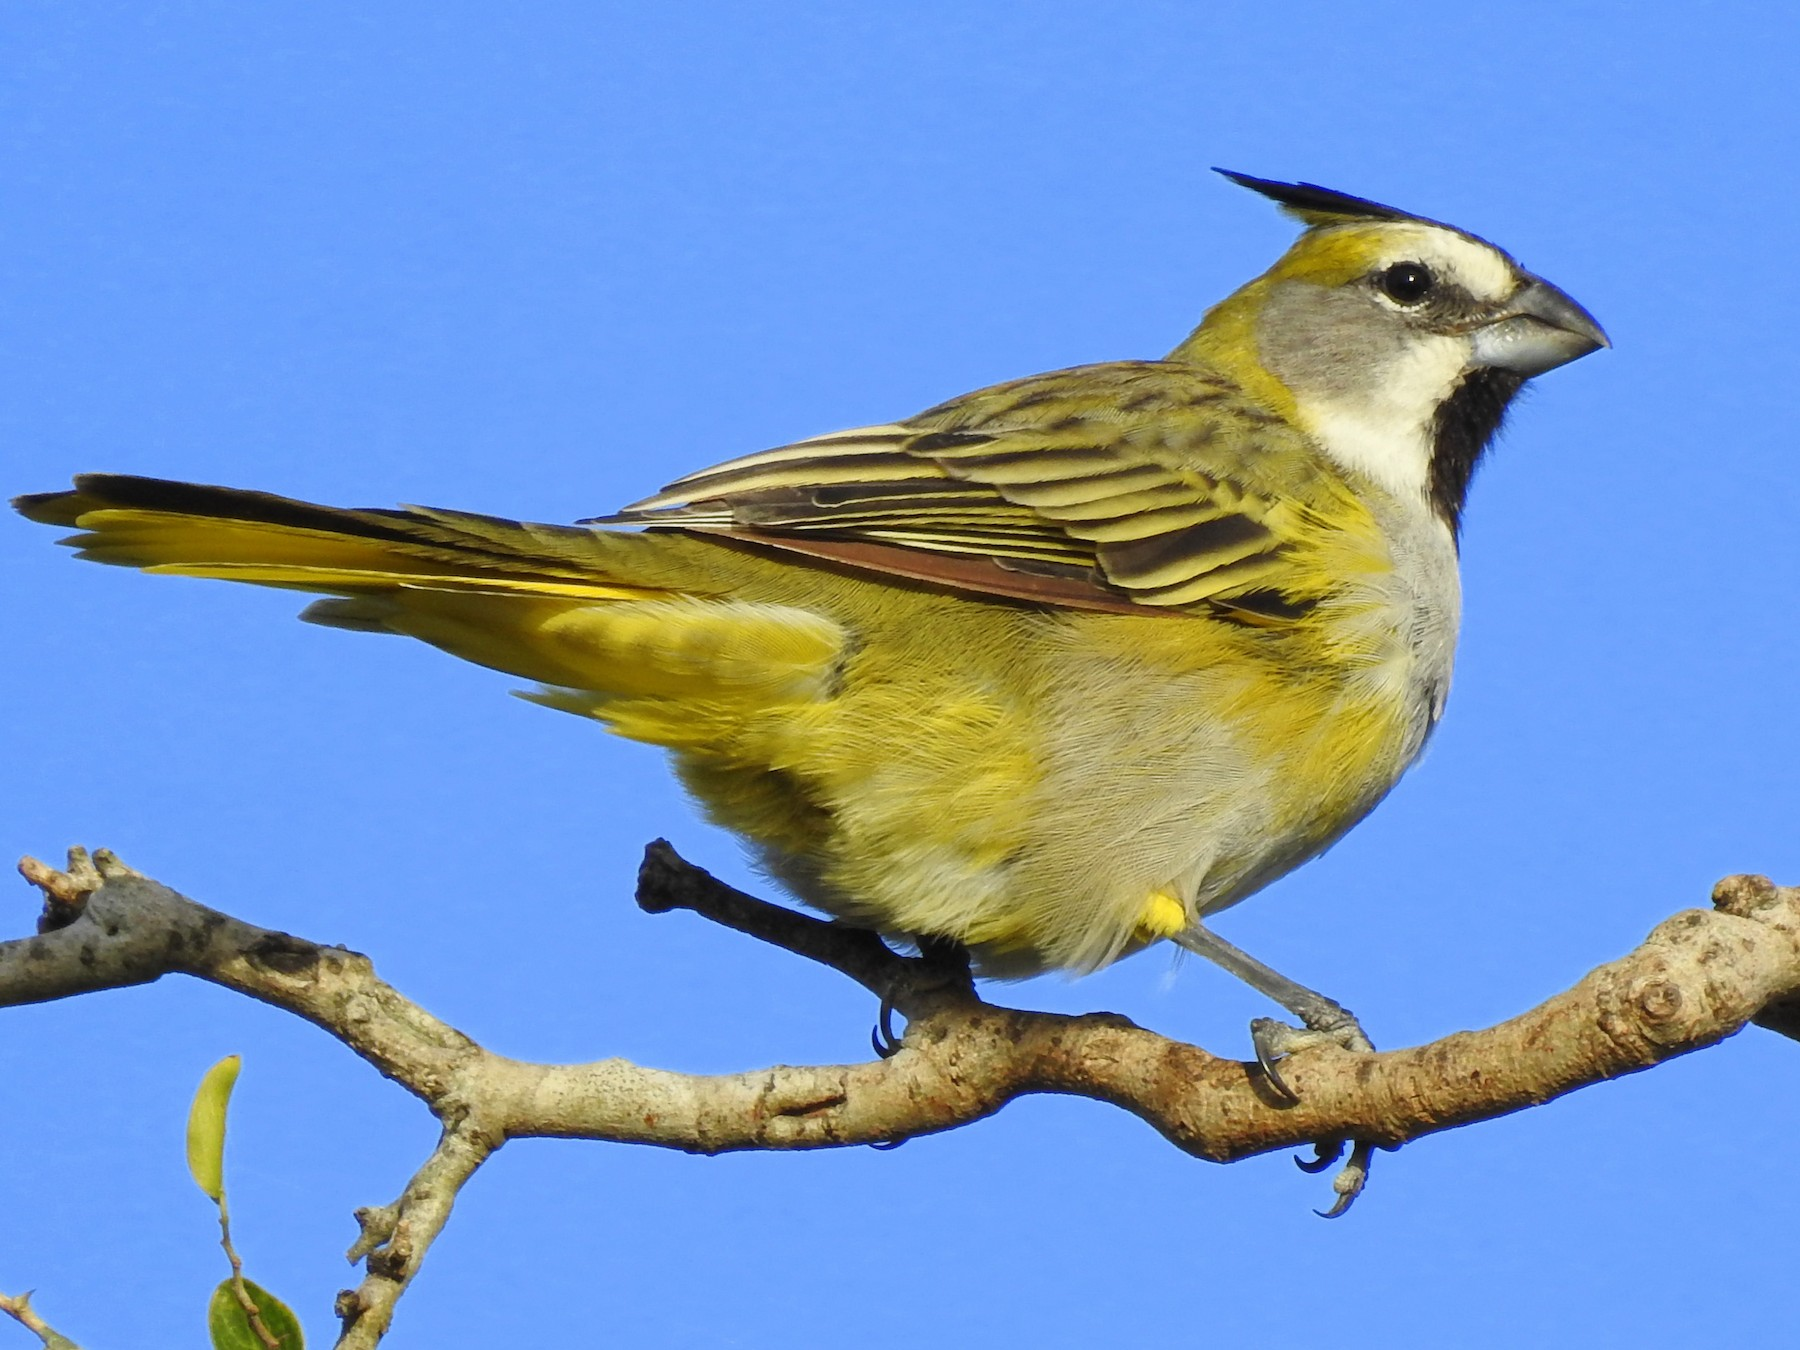 Yellow Cardinal - Carlos Crocce